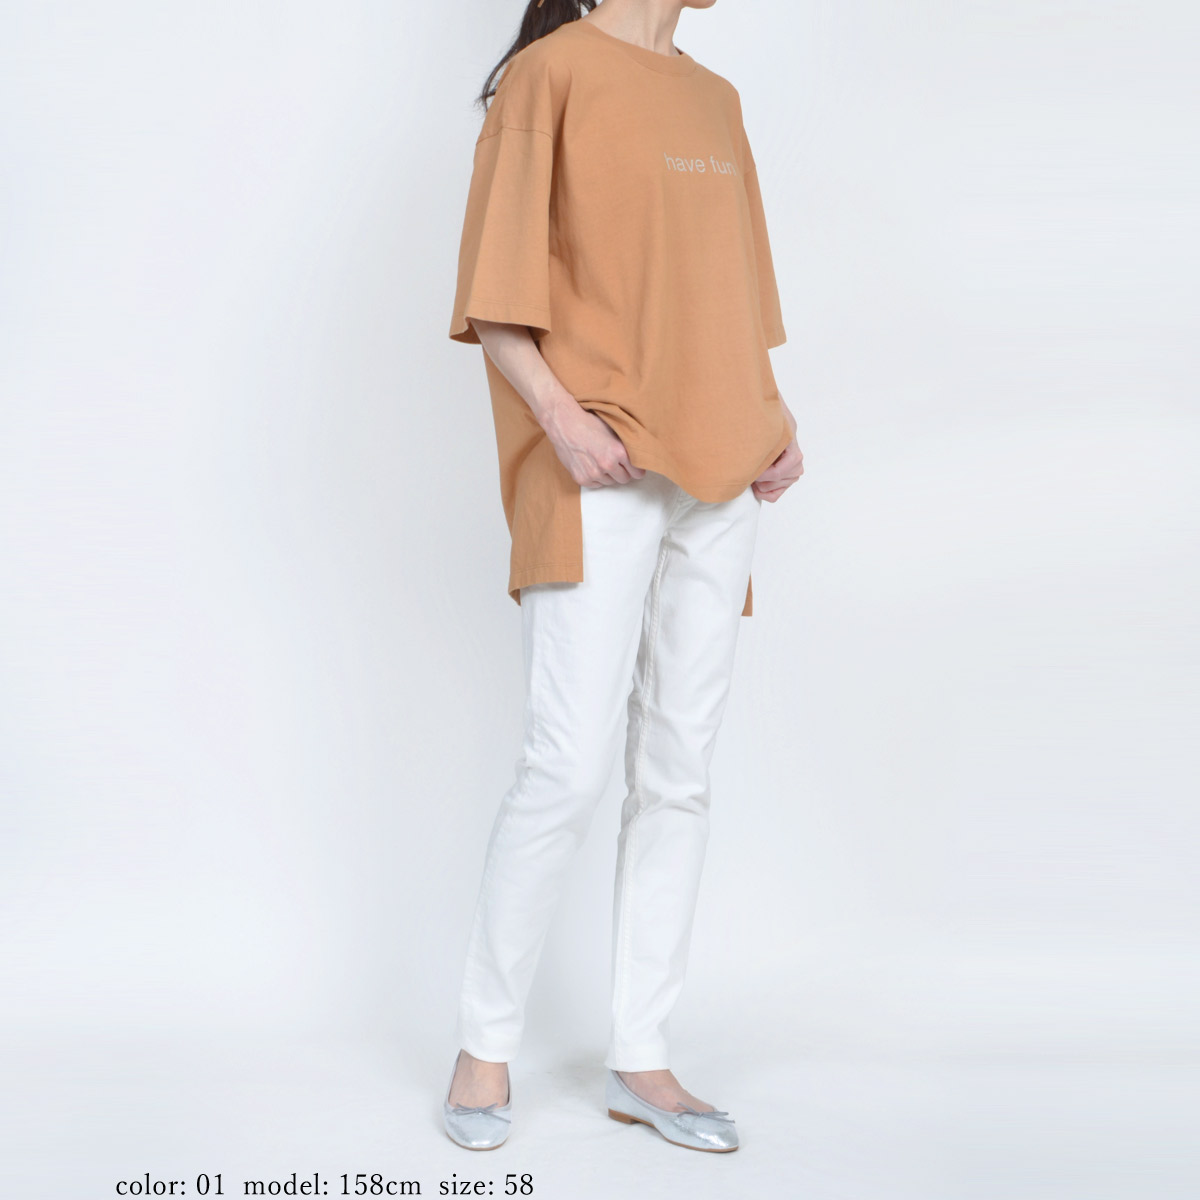 Sweet Camel ハイパワーストレッチdenimstaスキニー SC5381